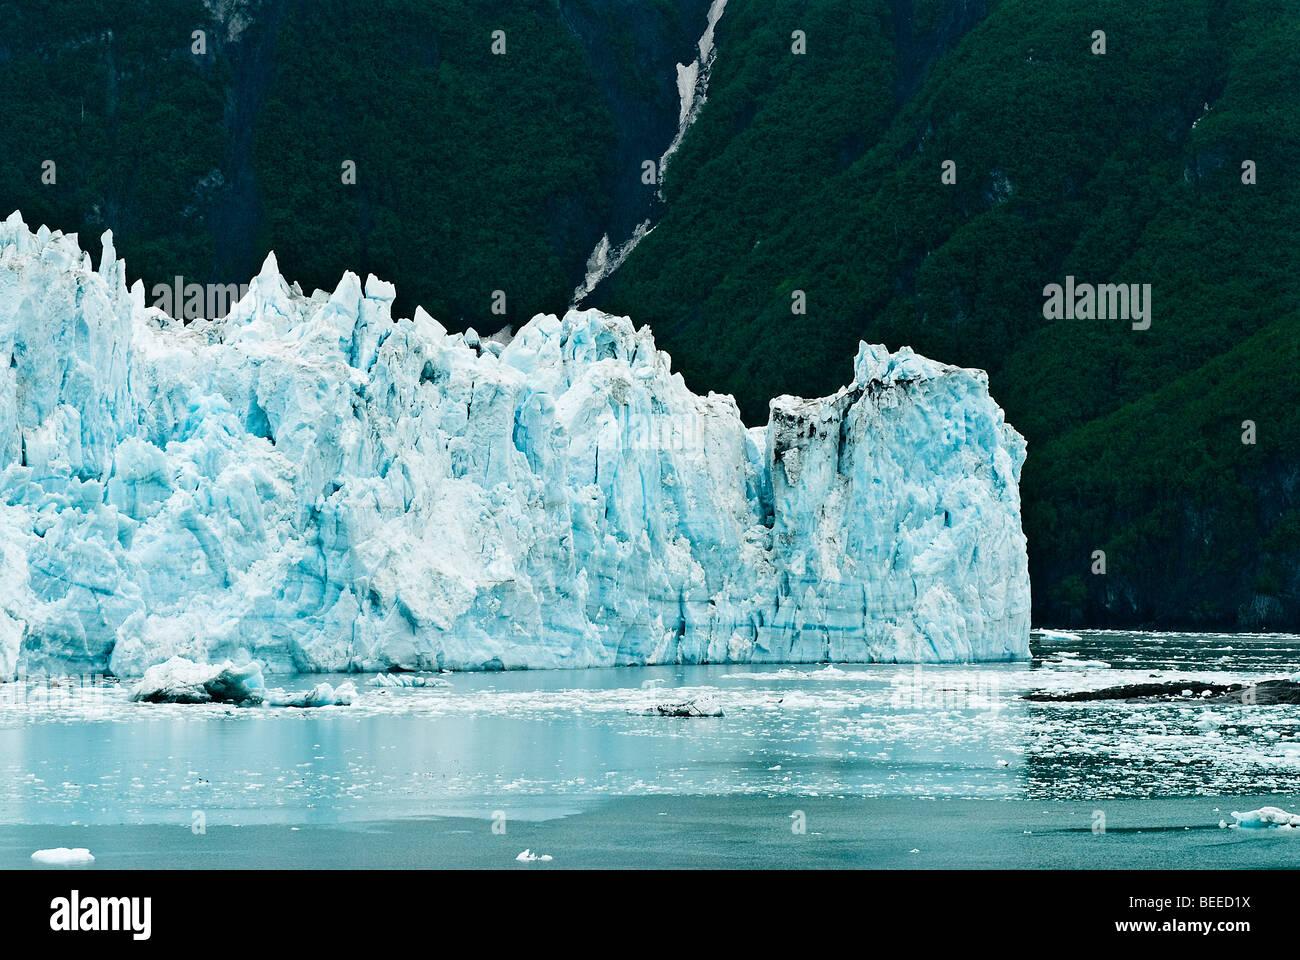 Hubbard Glacier, Disenchantment Bay, Alaska, USA - Stock Image